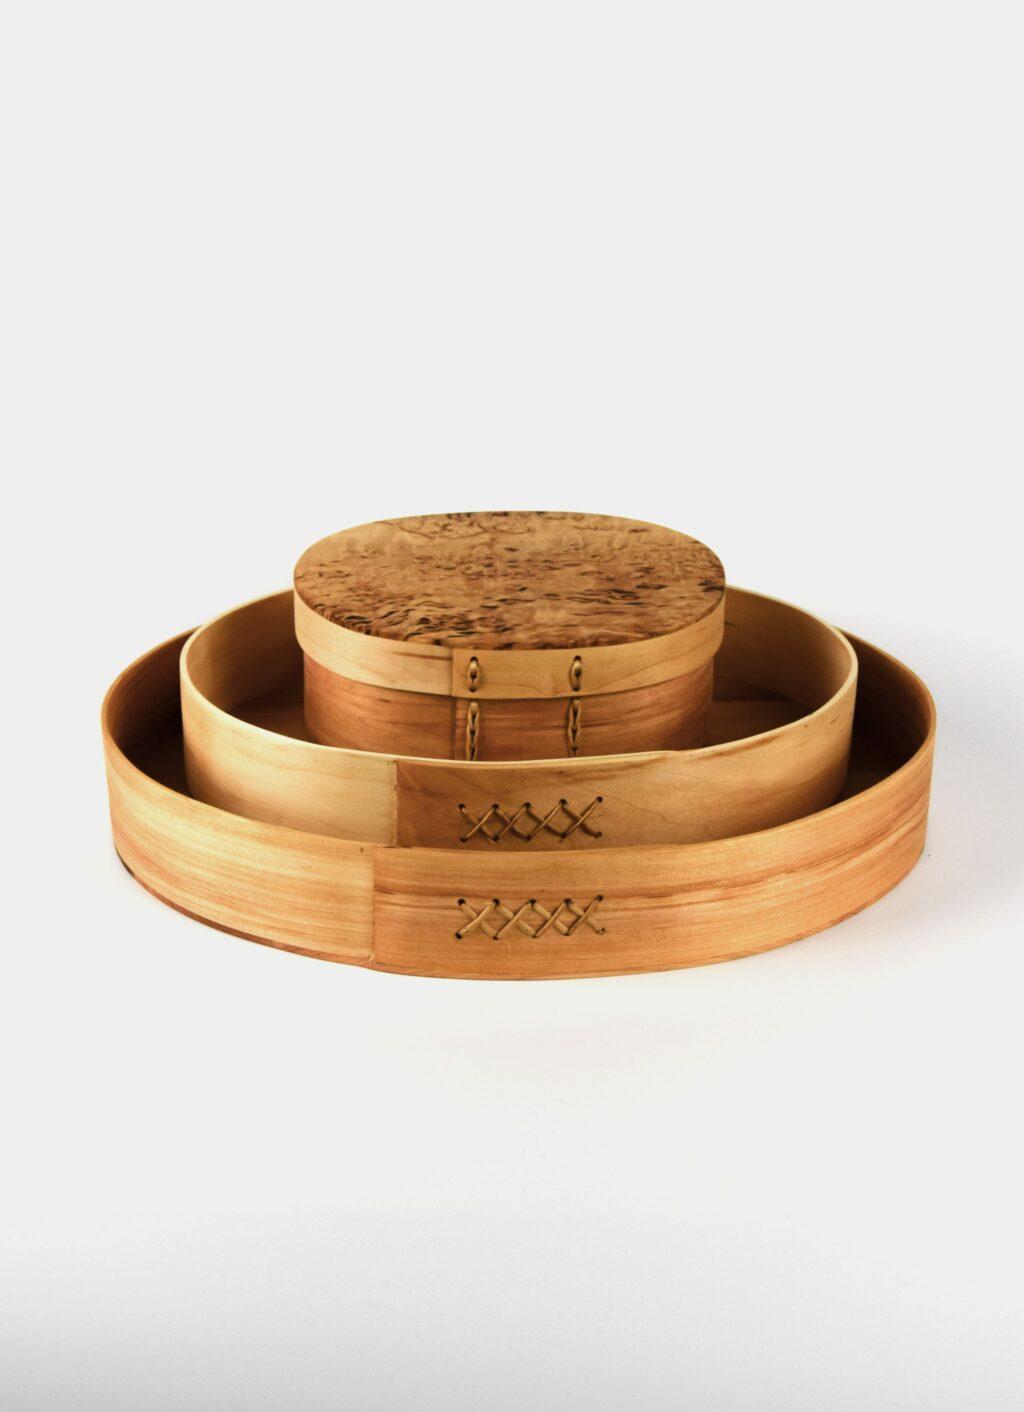 Ljungars Bo-Ake - Handmade - Alder and Birch - Shaker Tray - Large